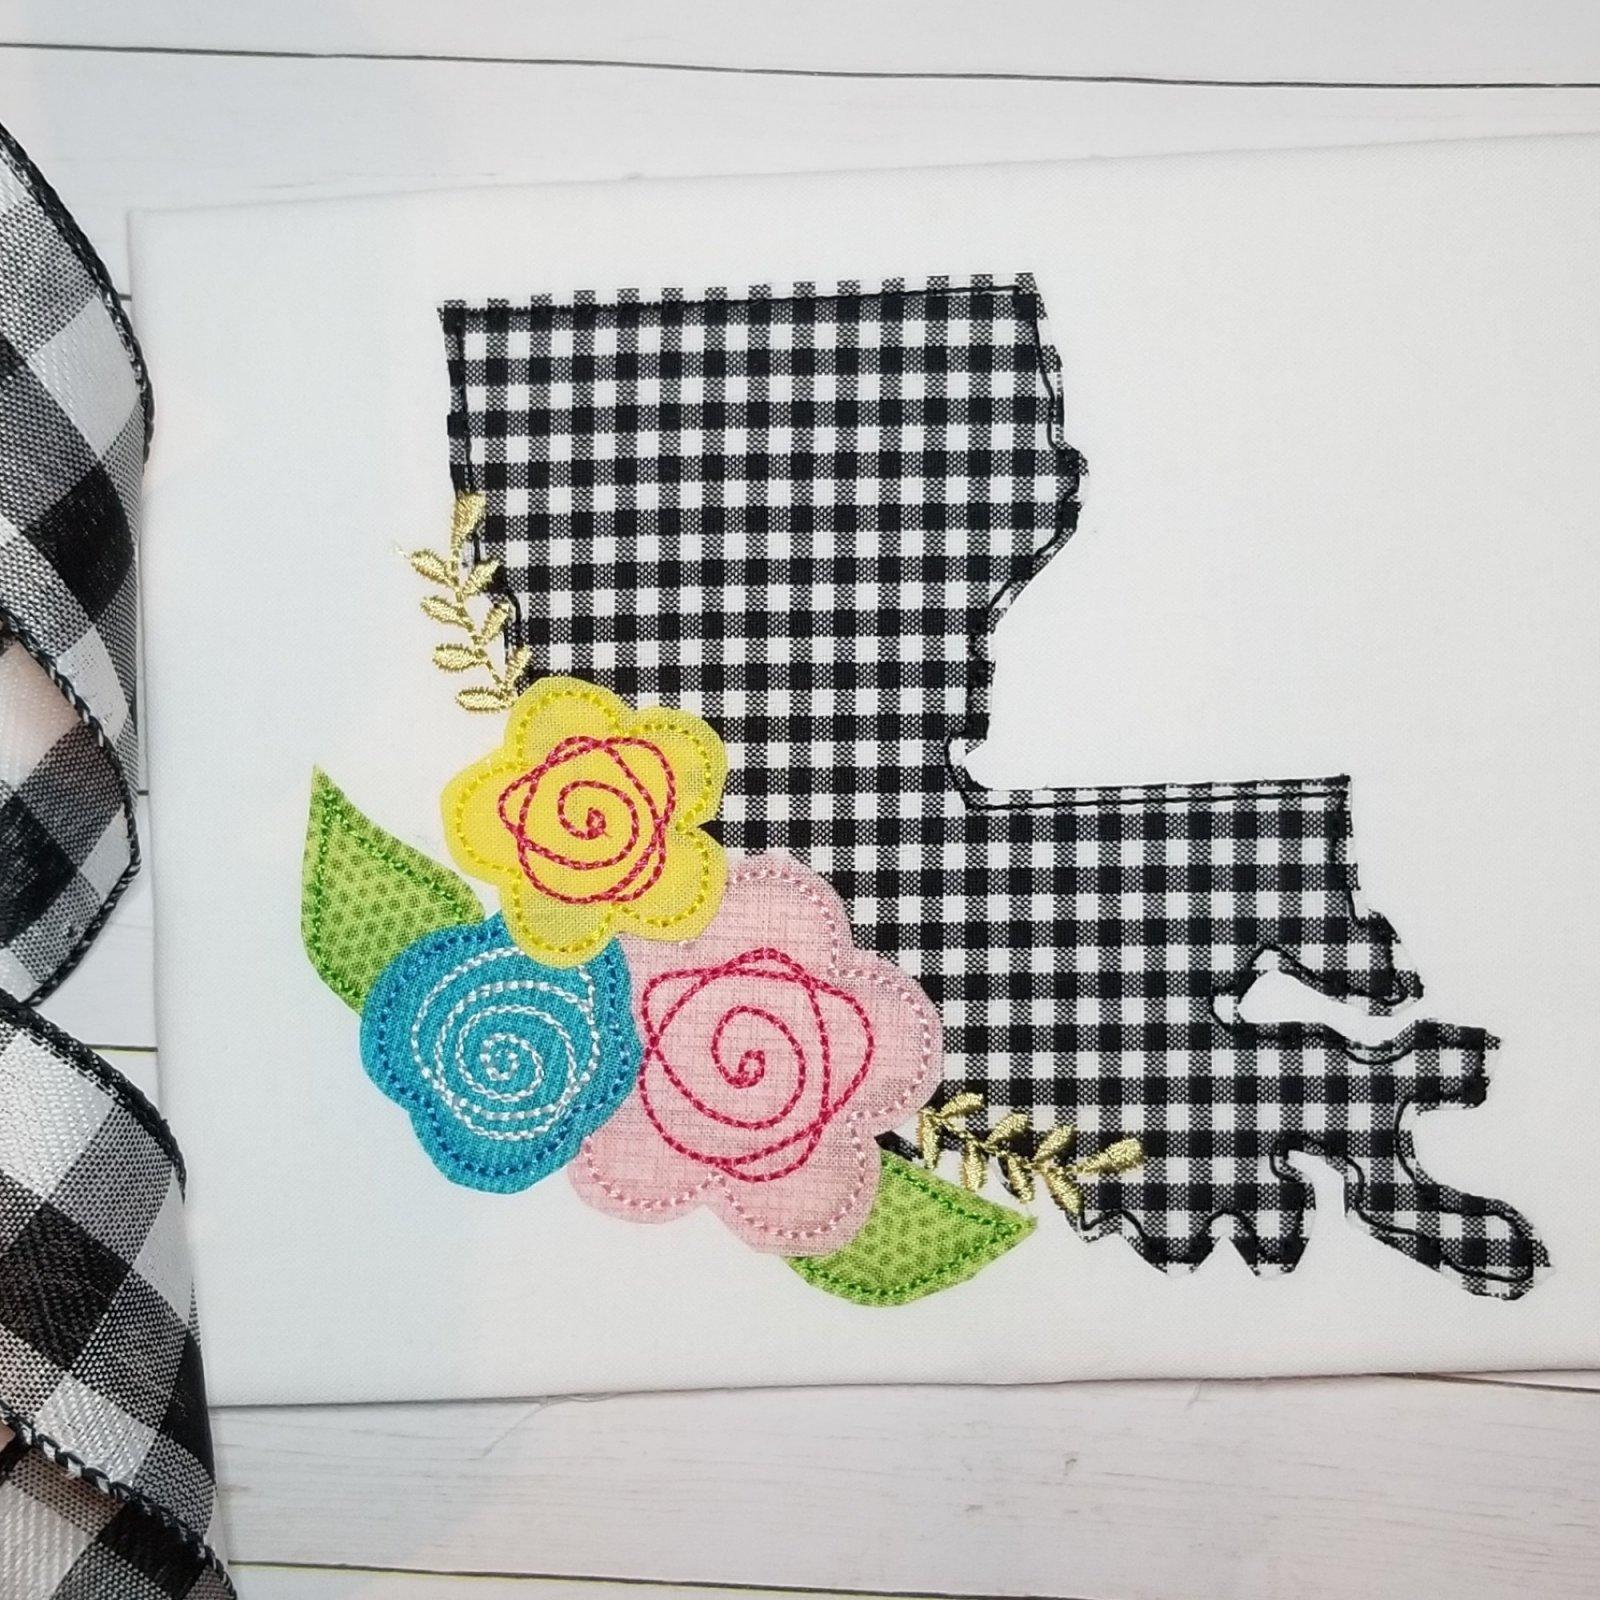 Louisiana with Flowers Applique Design